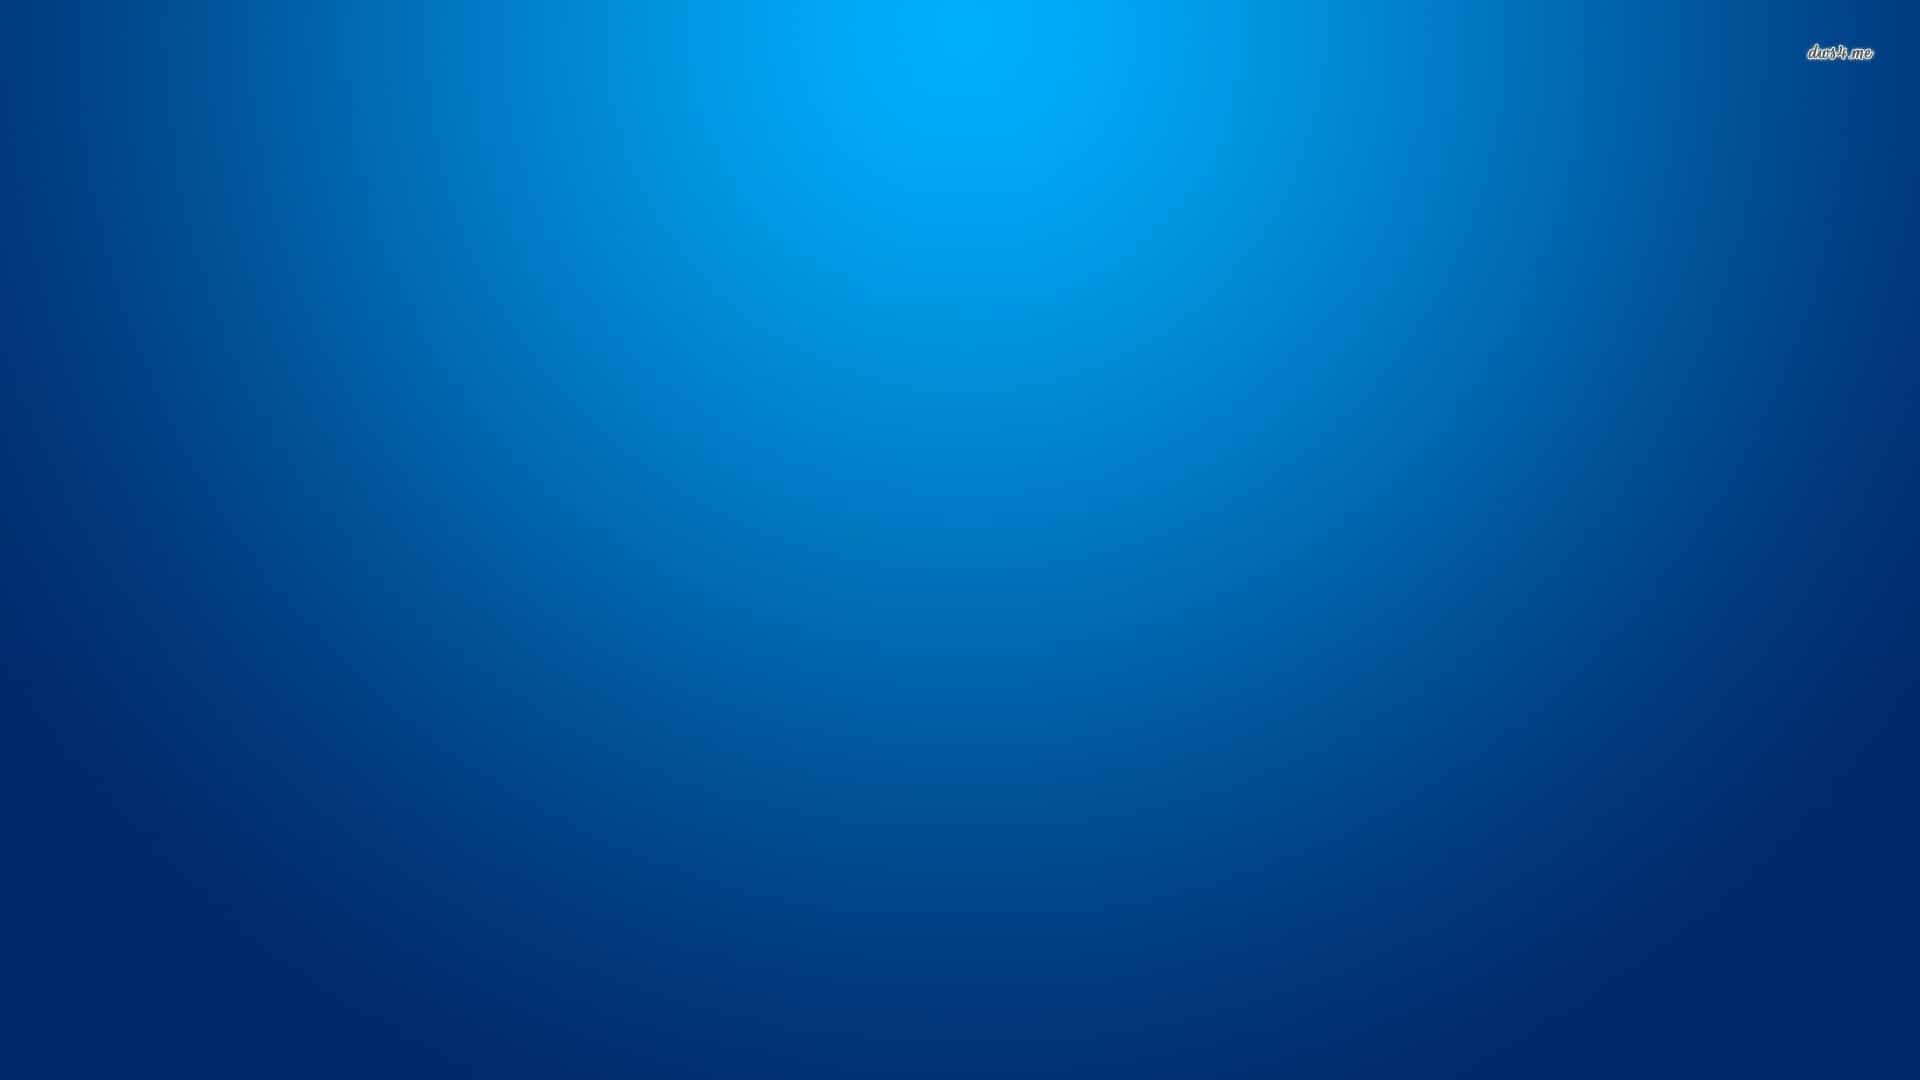 blue-gradient-wallpaper-2